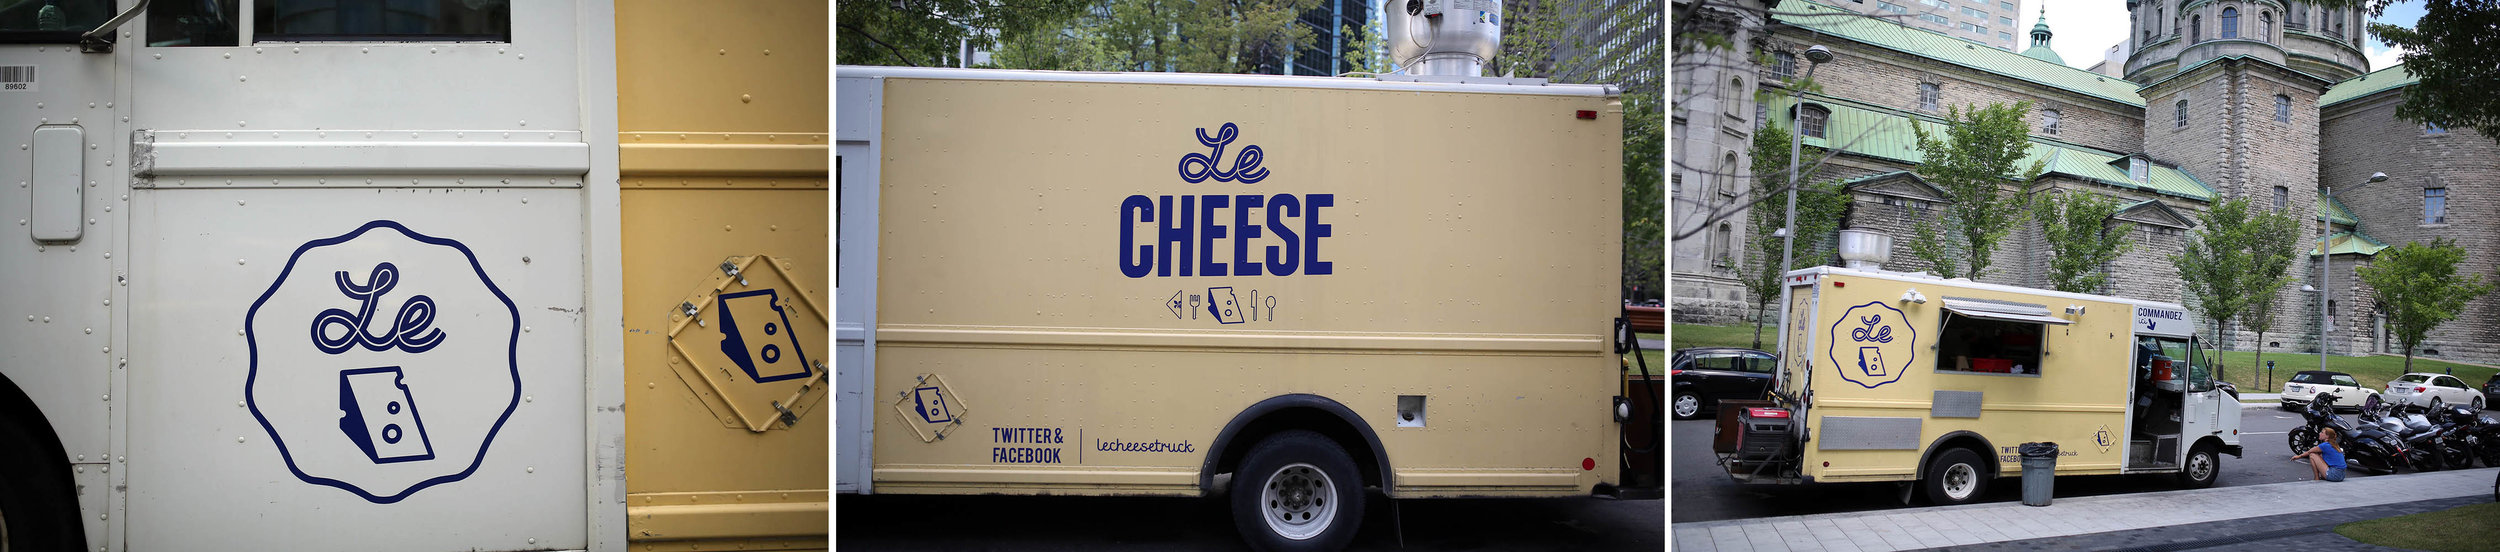 heh heh heh  Le Cheese .